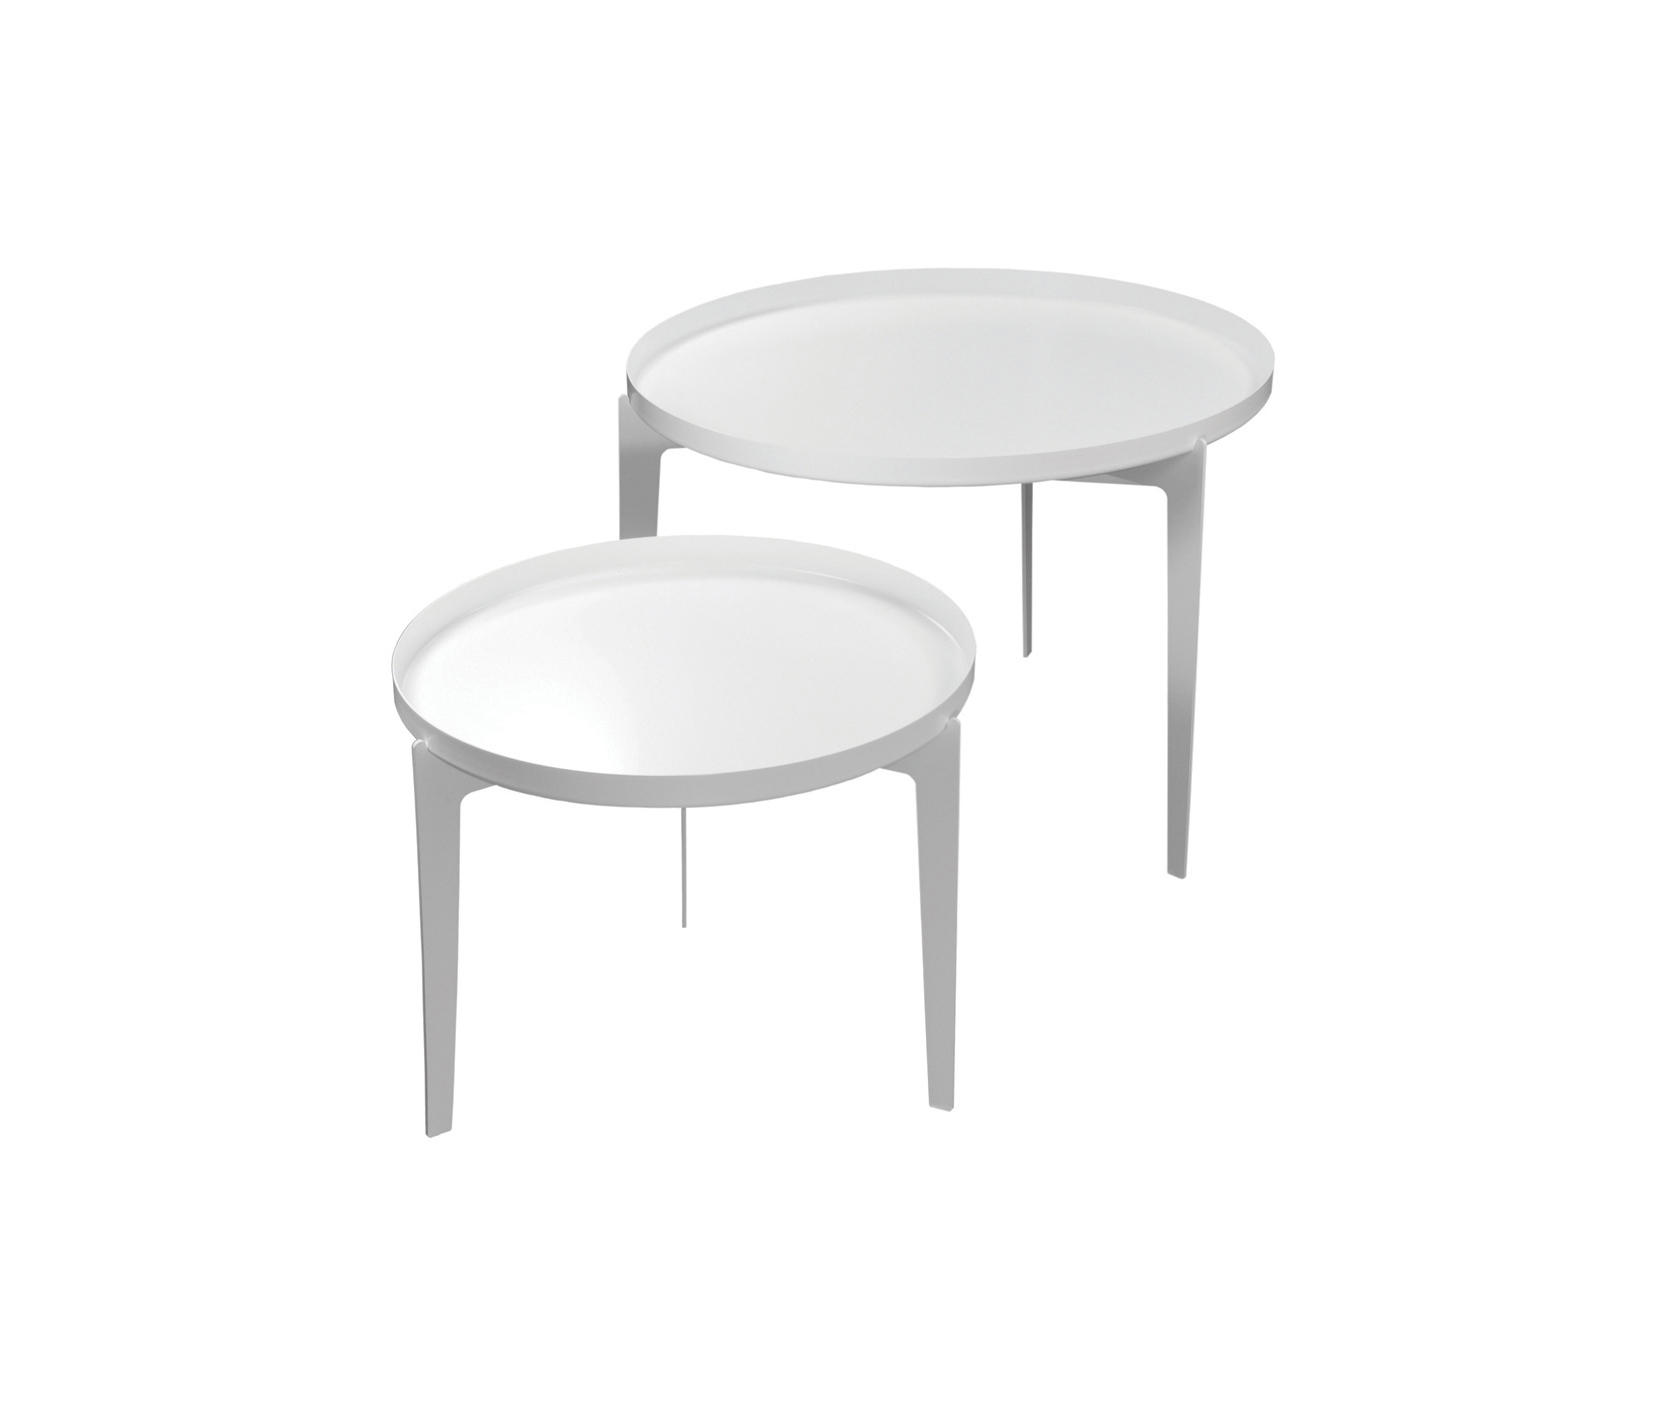 Illusion Coffe Table By Covo ...